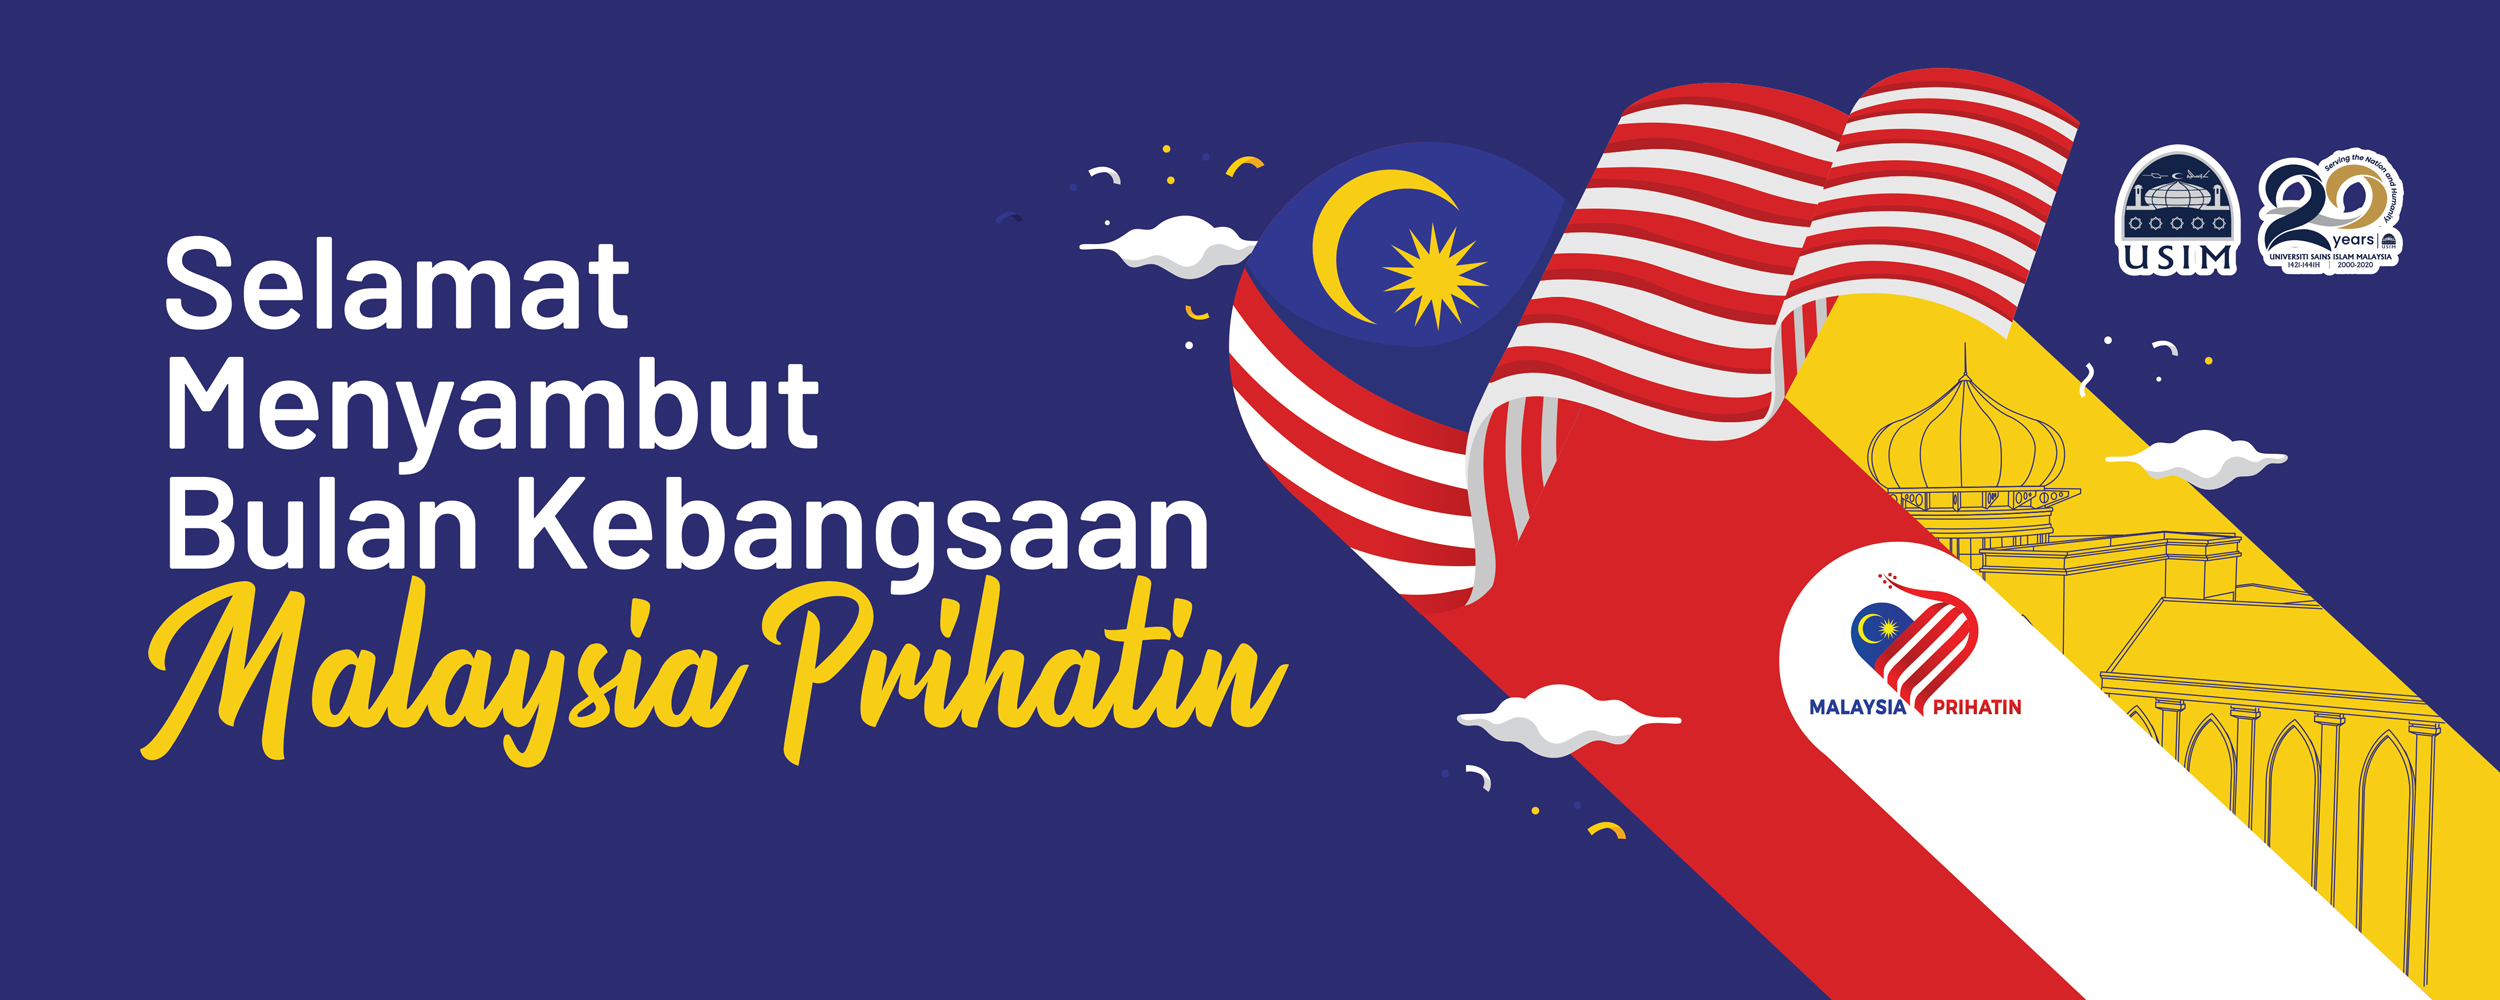 Usim Universiti Sains Islam Malaysia